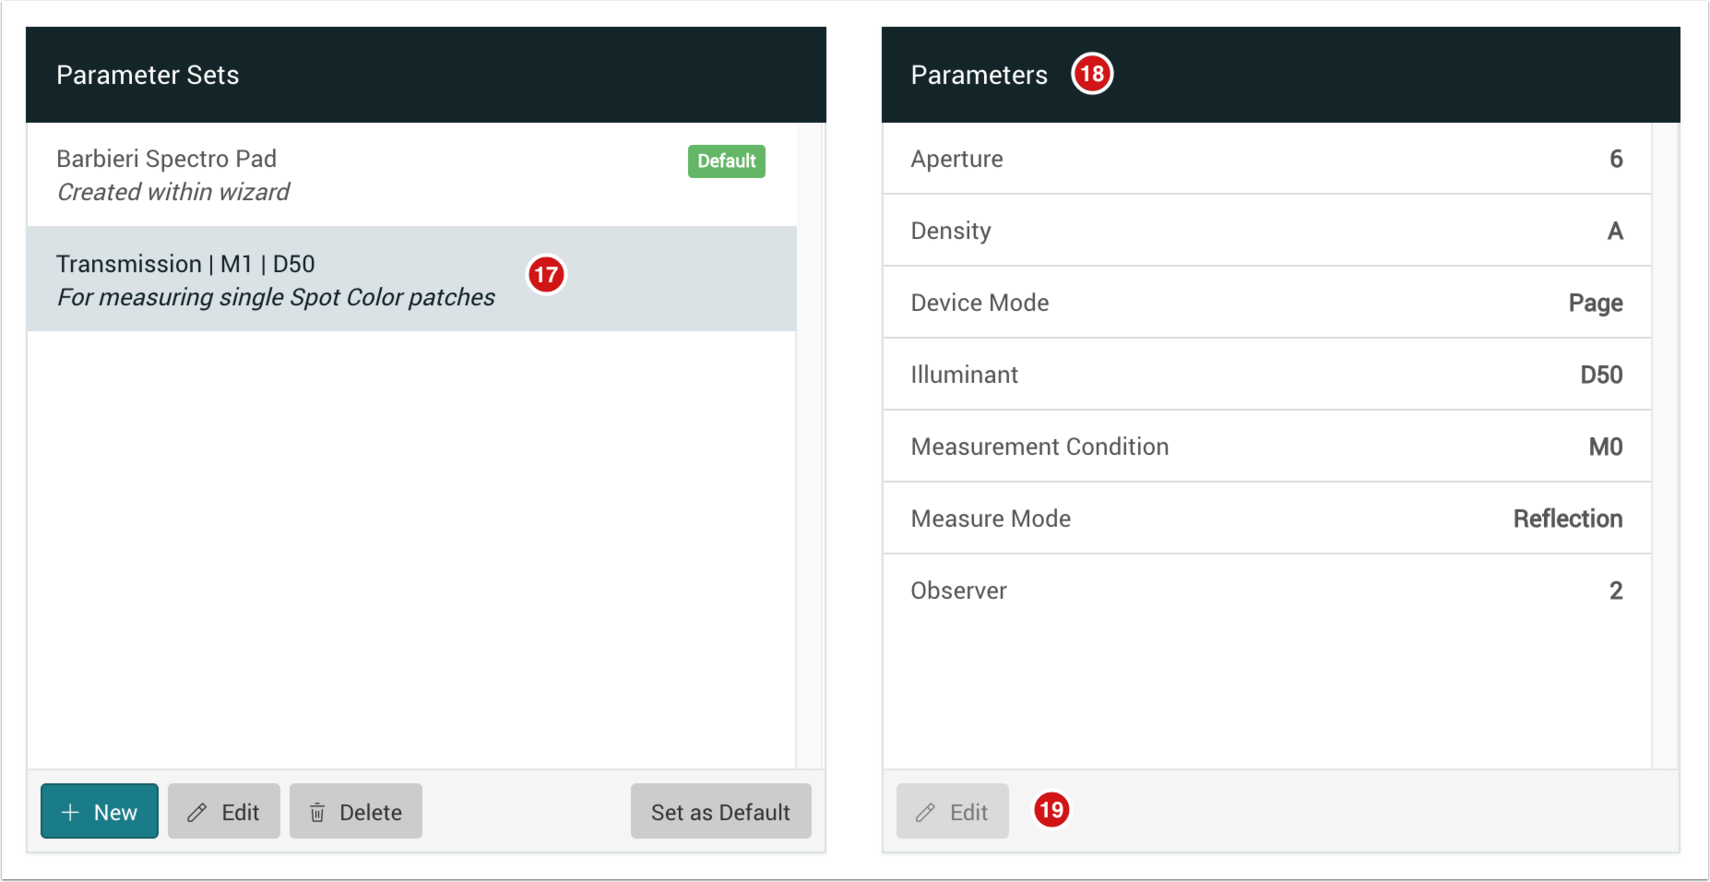 Parameter Sets and Parameters